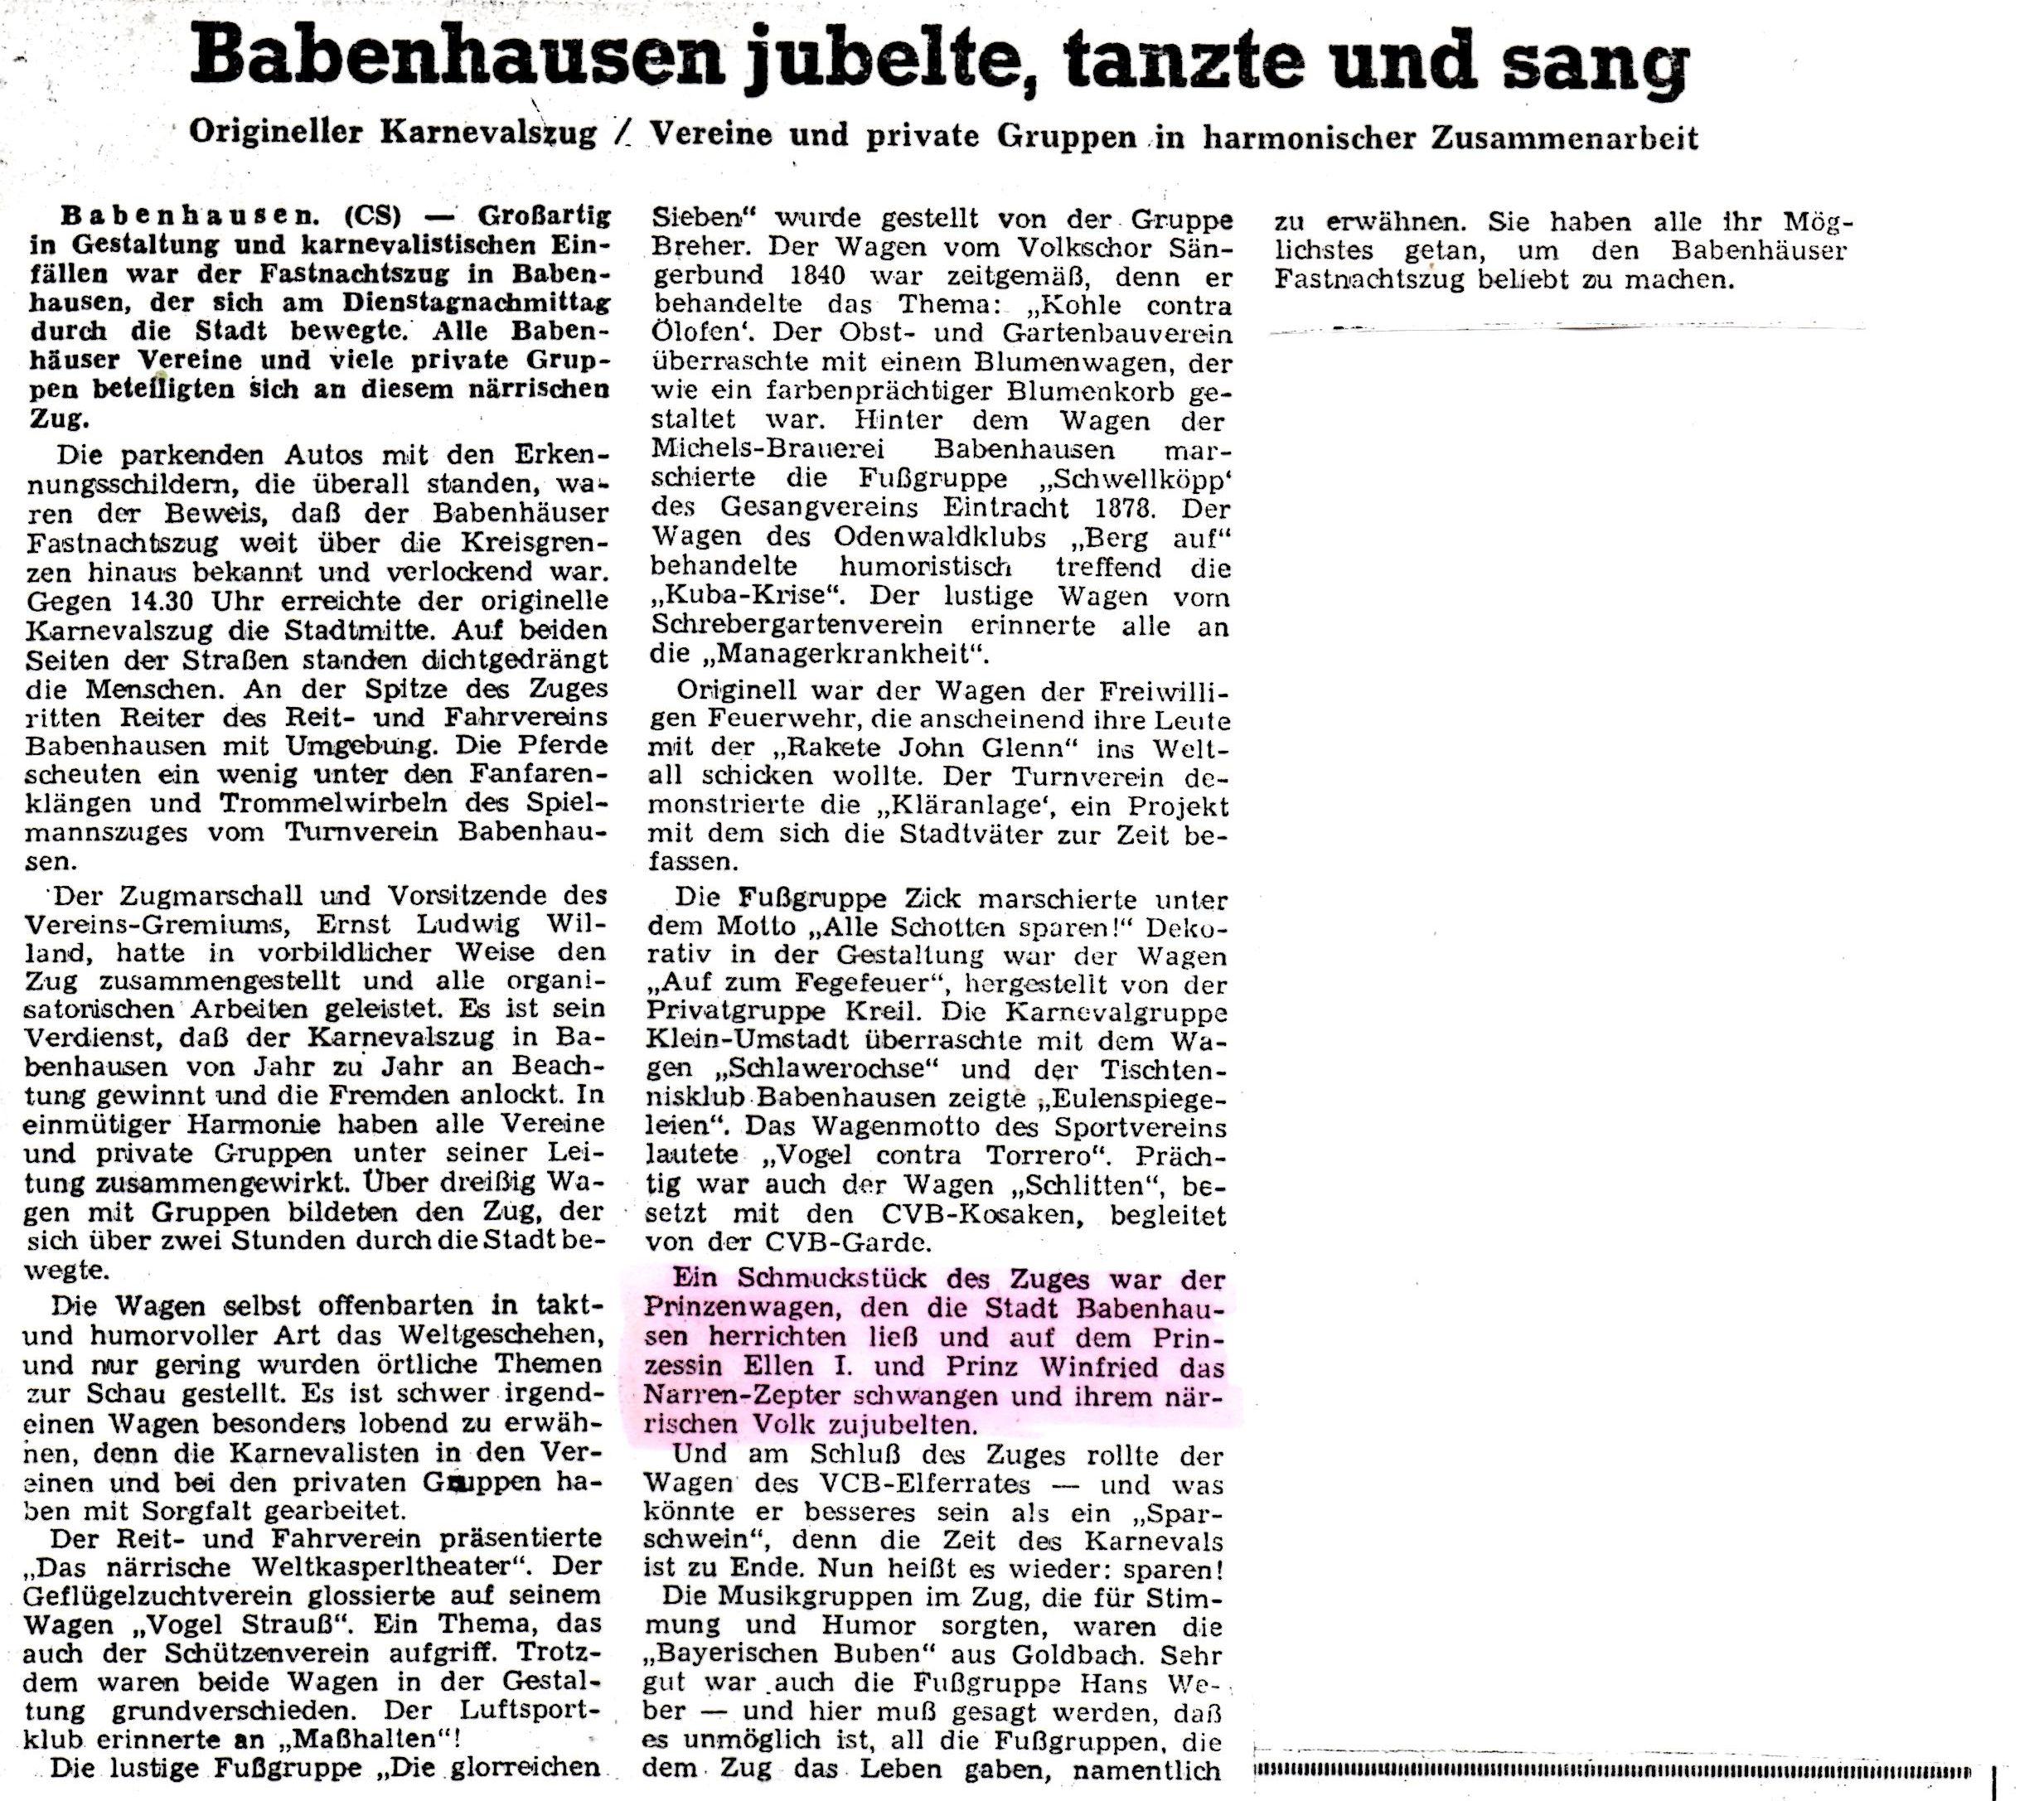 http://hessische-ludwigsbahn.de/196391.jpg